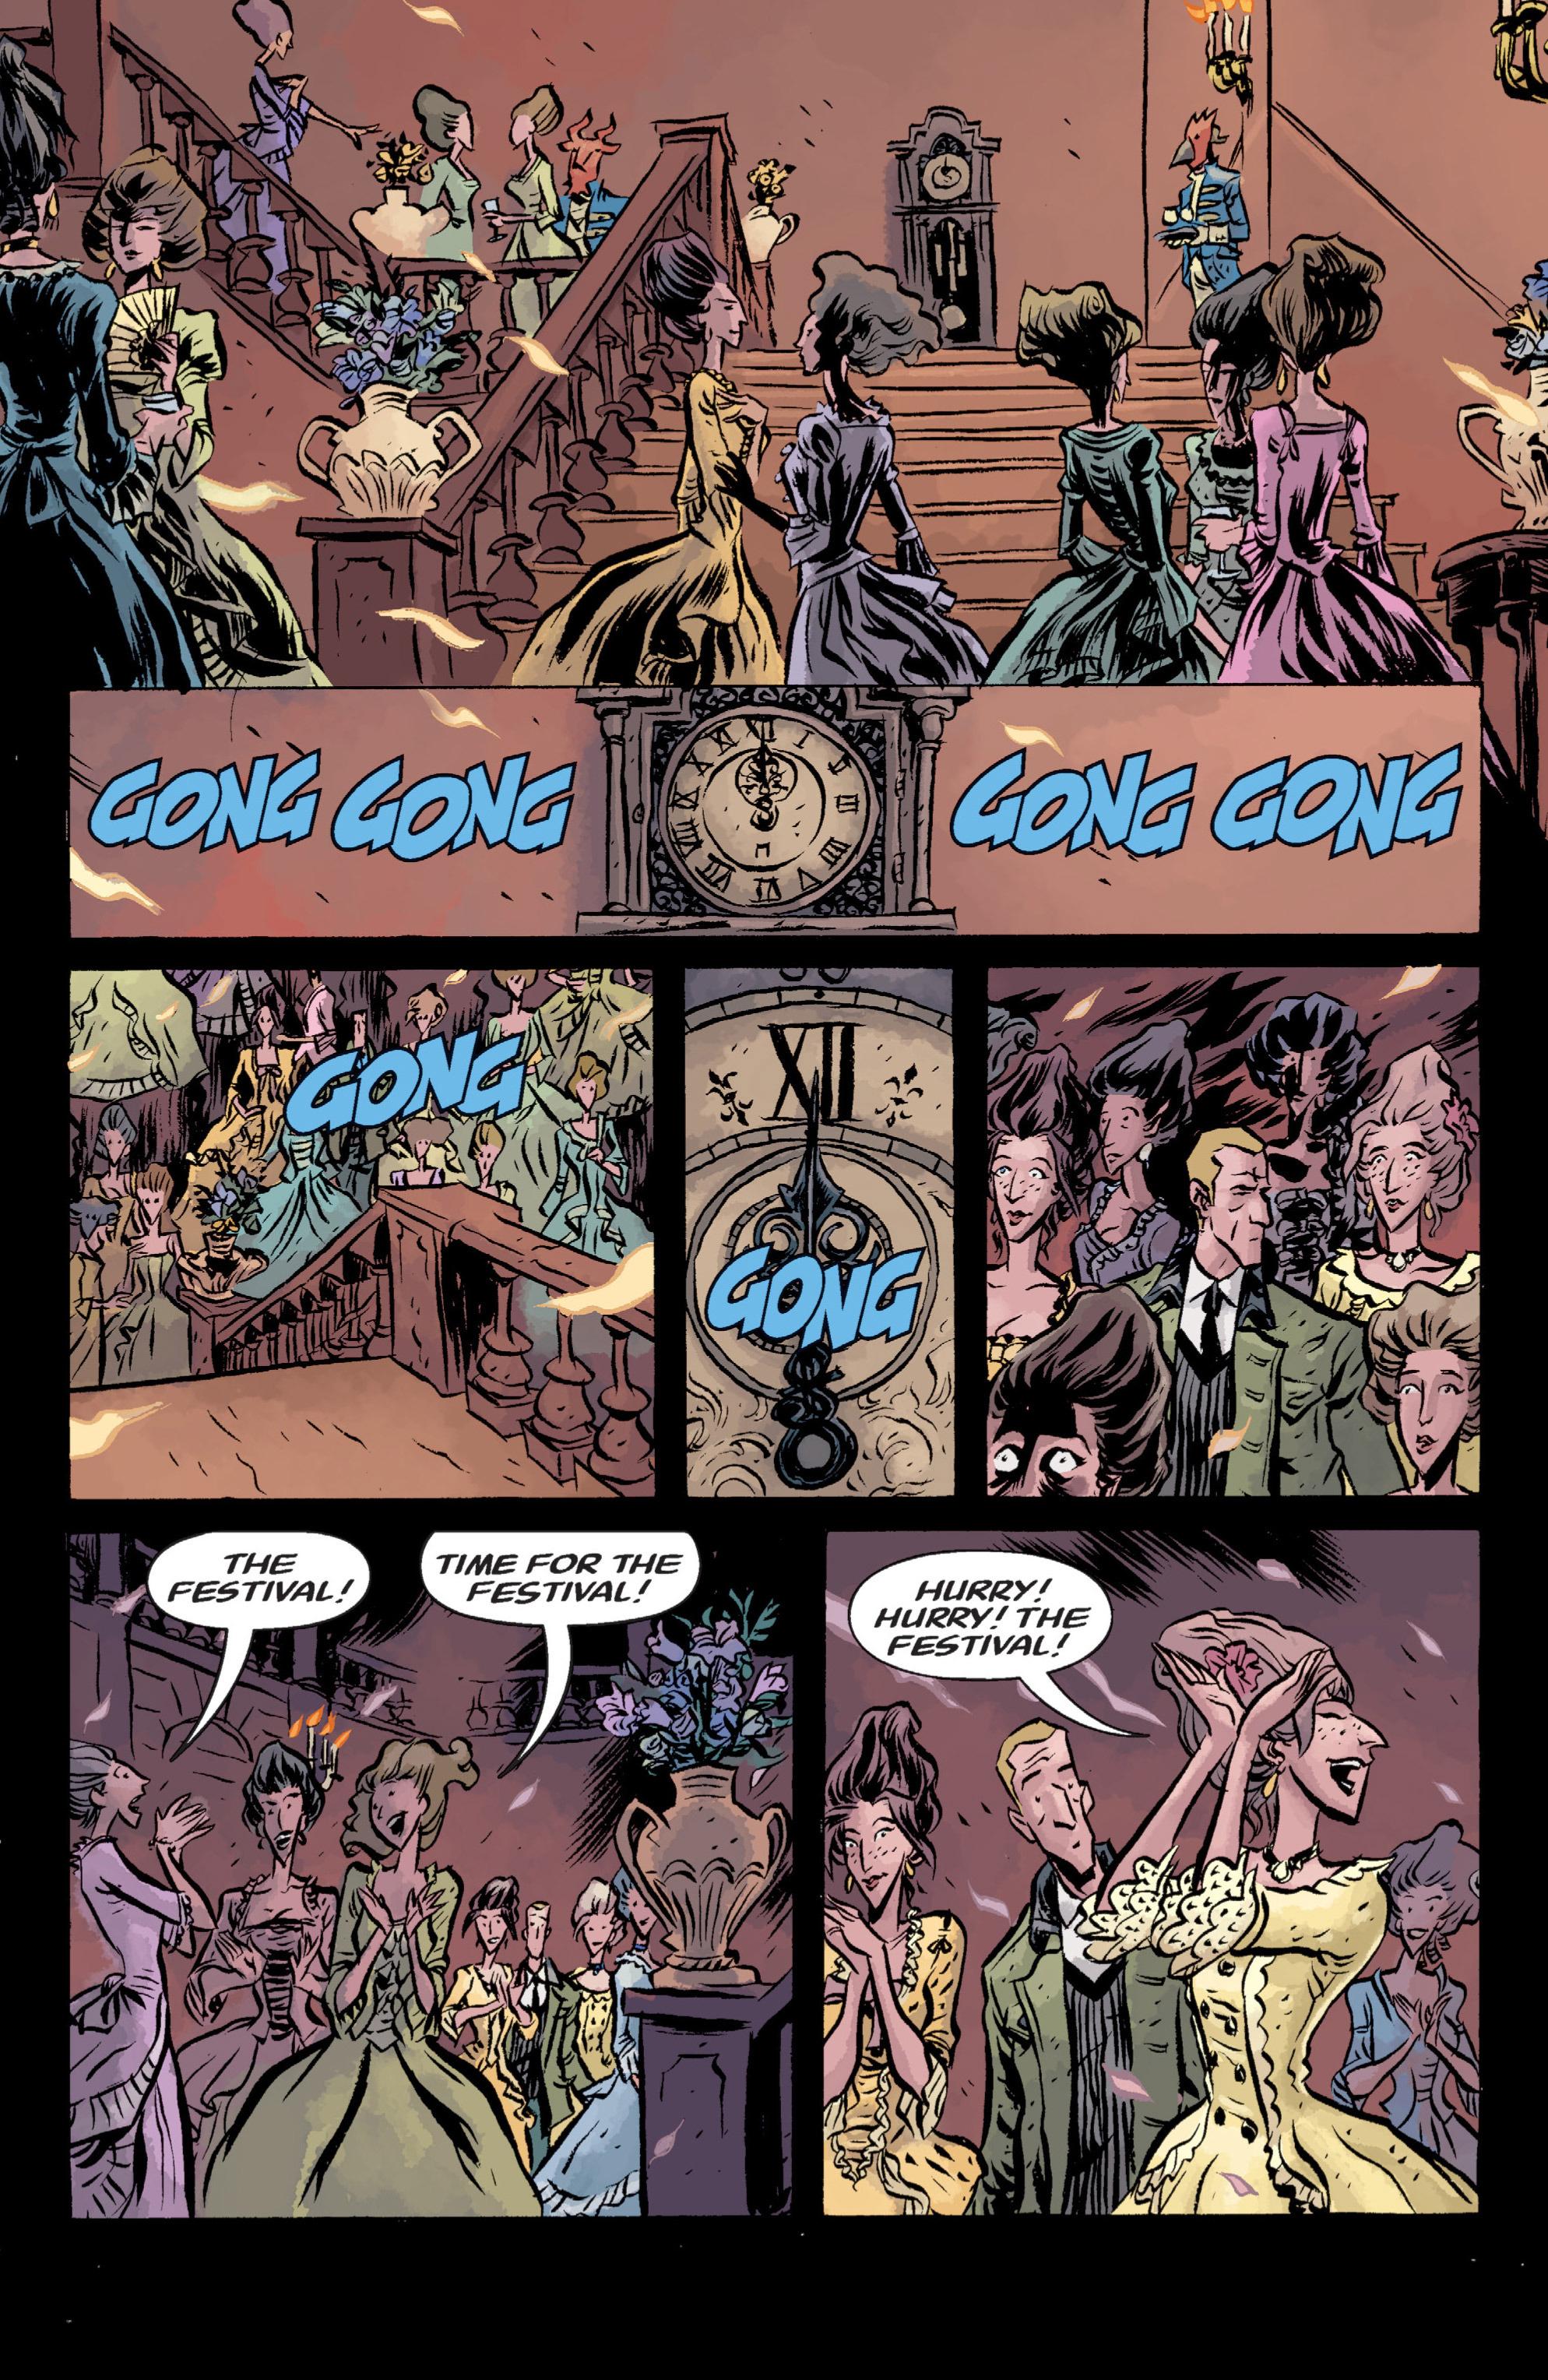 Read online B.P.R.D. (2003) comic -  Issue # TPB 13 - 42